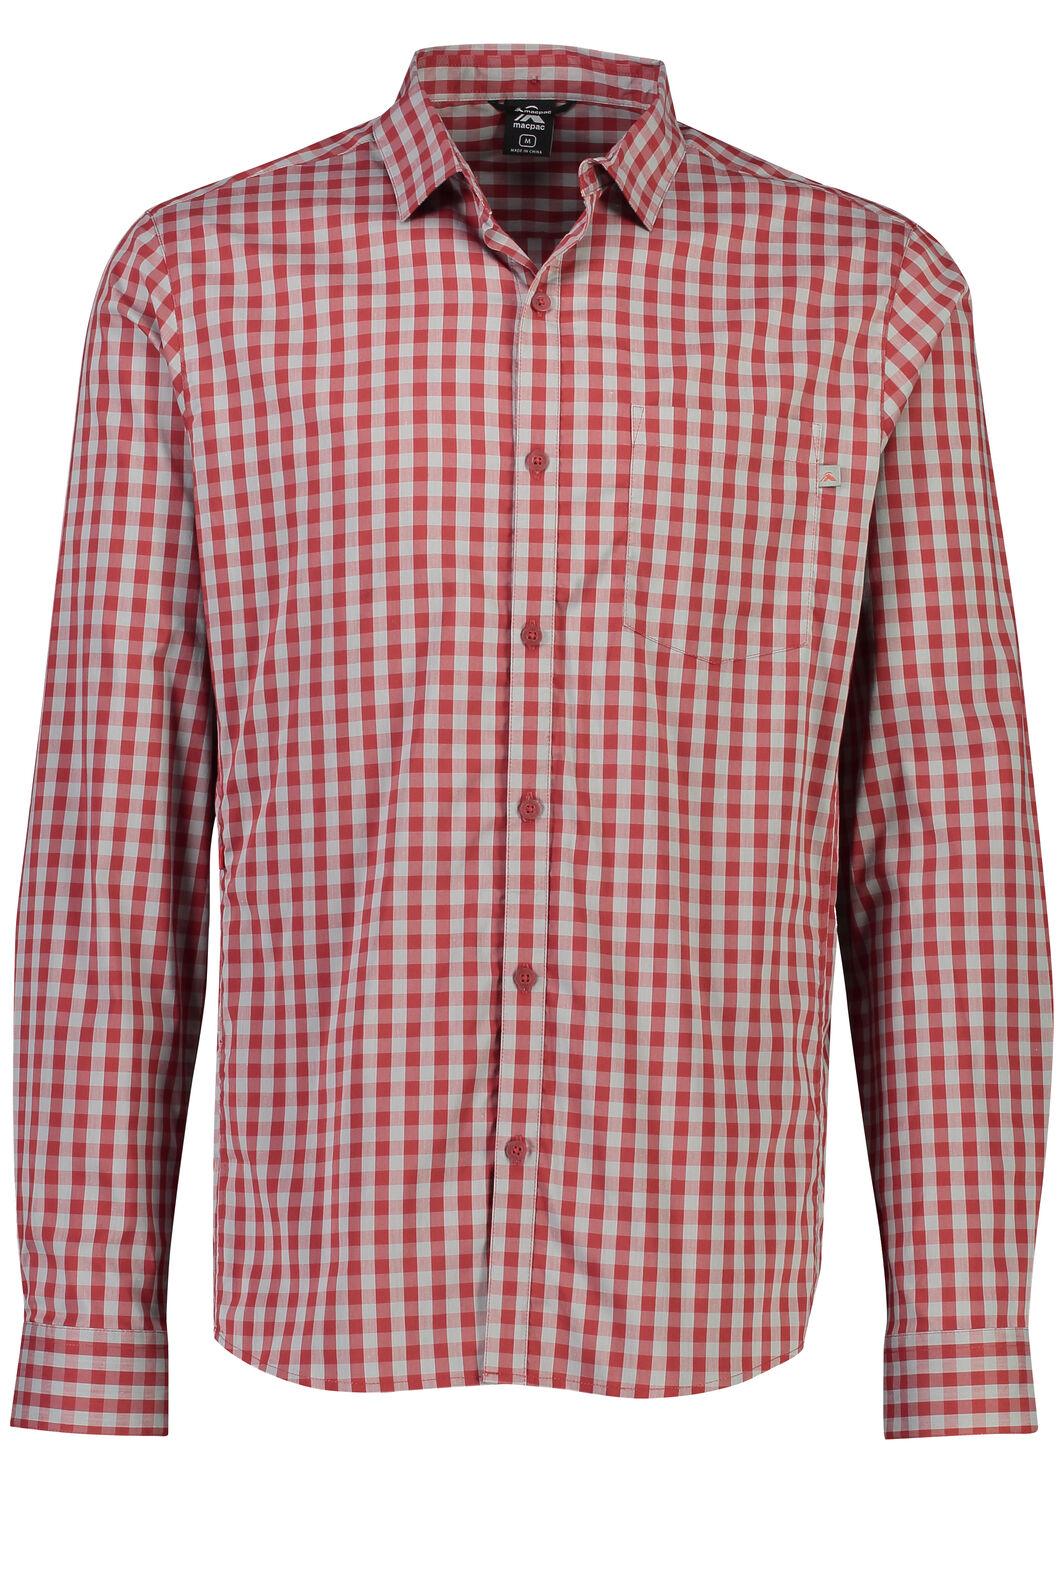 Macpac Crossroad Long Sleeve Shirt - Men's, Sundried Tomato, hi-res